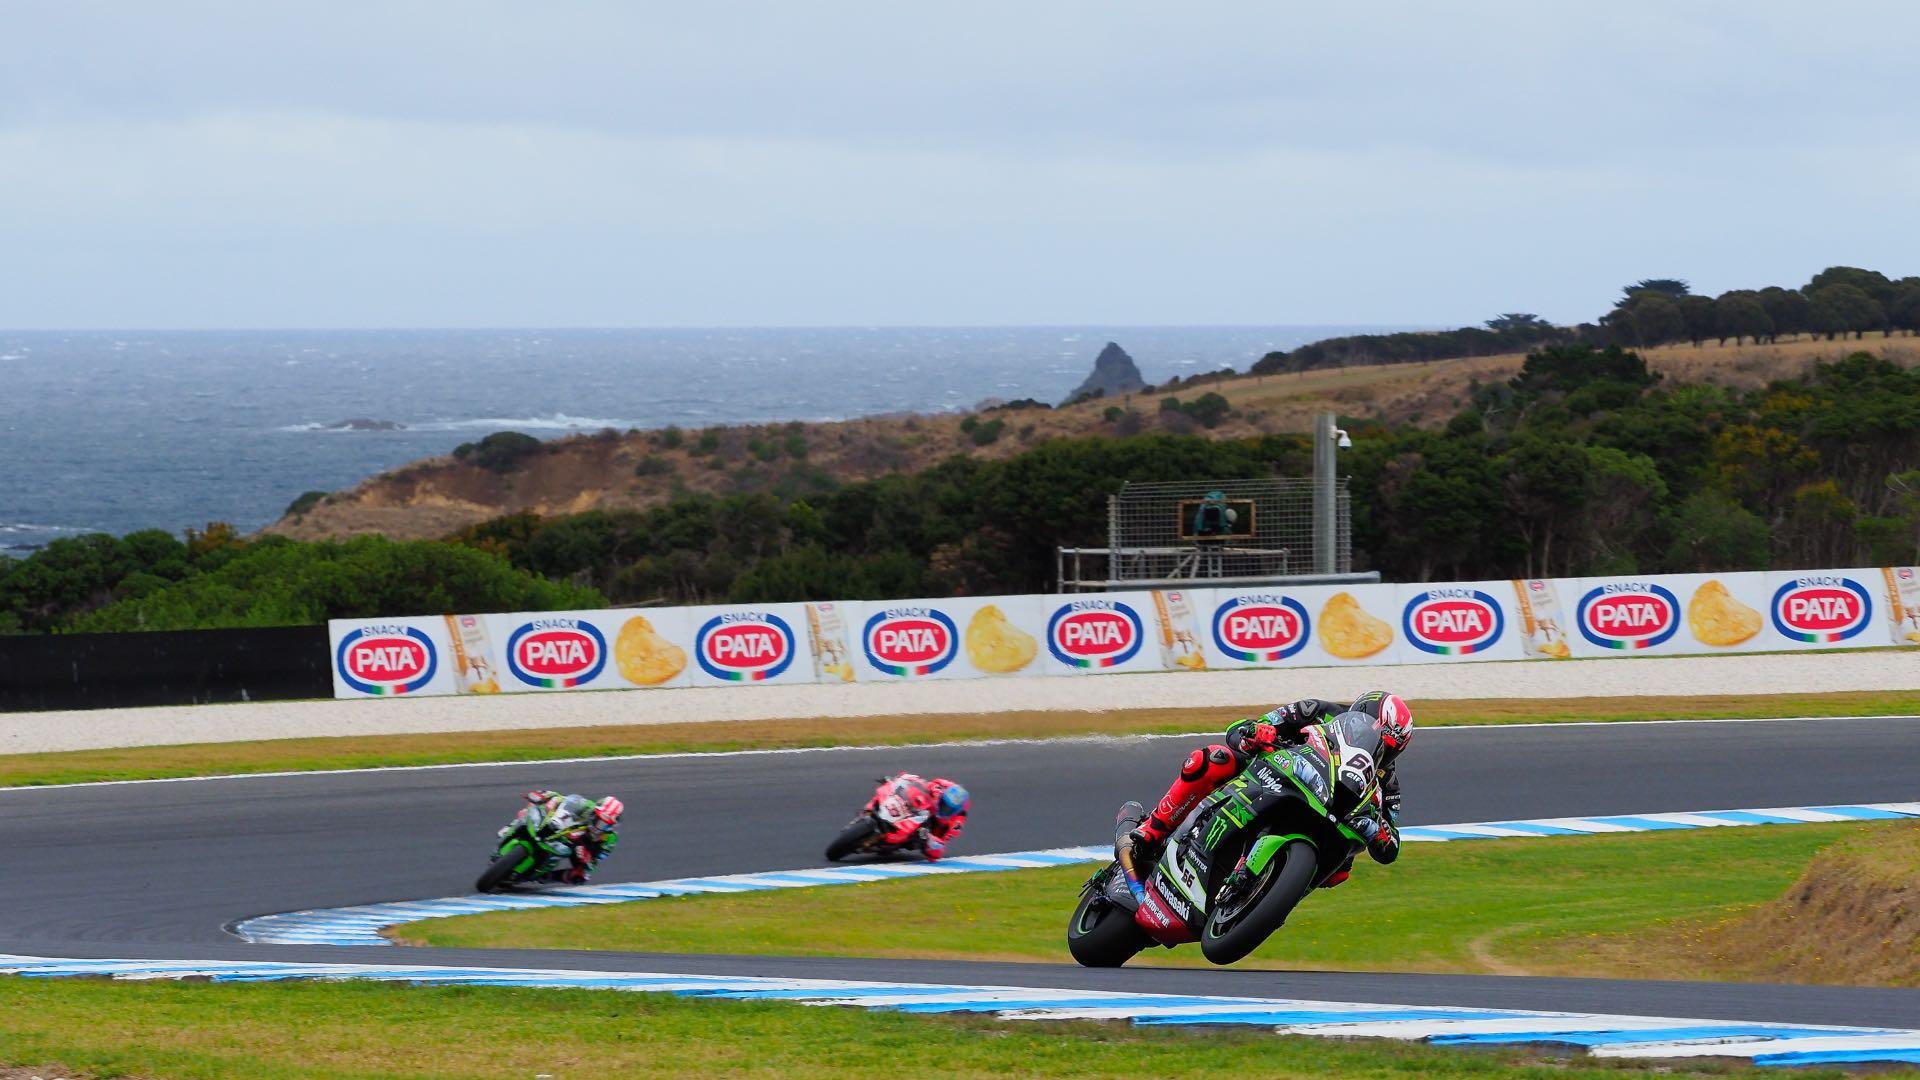 2018 Phillip Island World Superbike Results